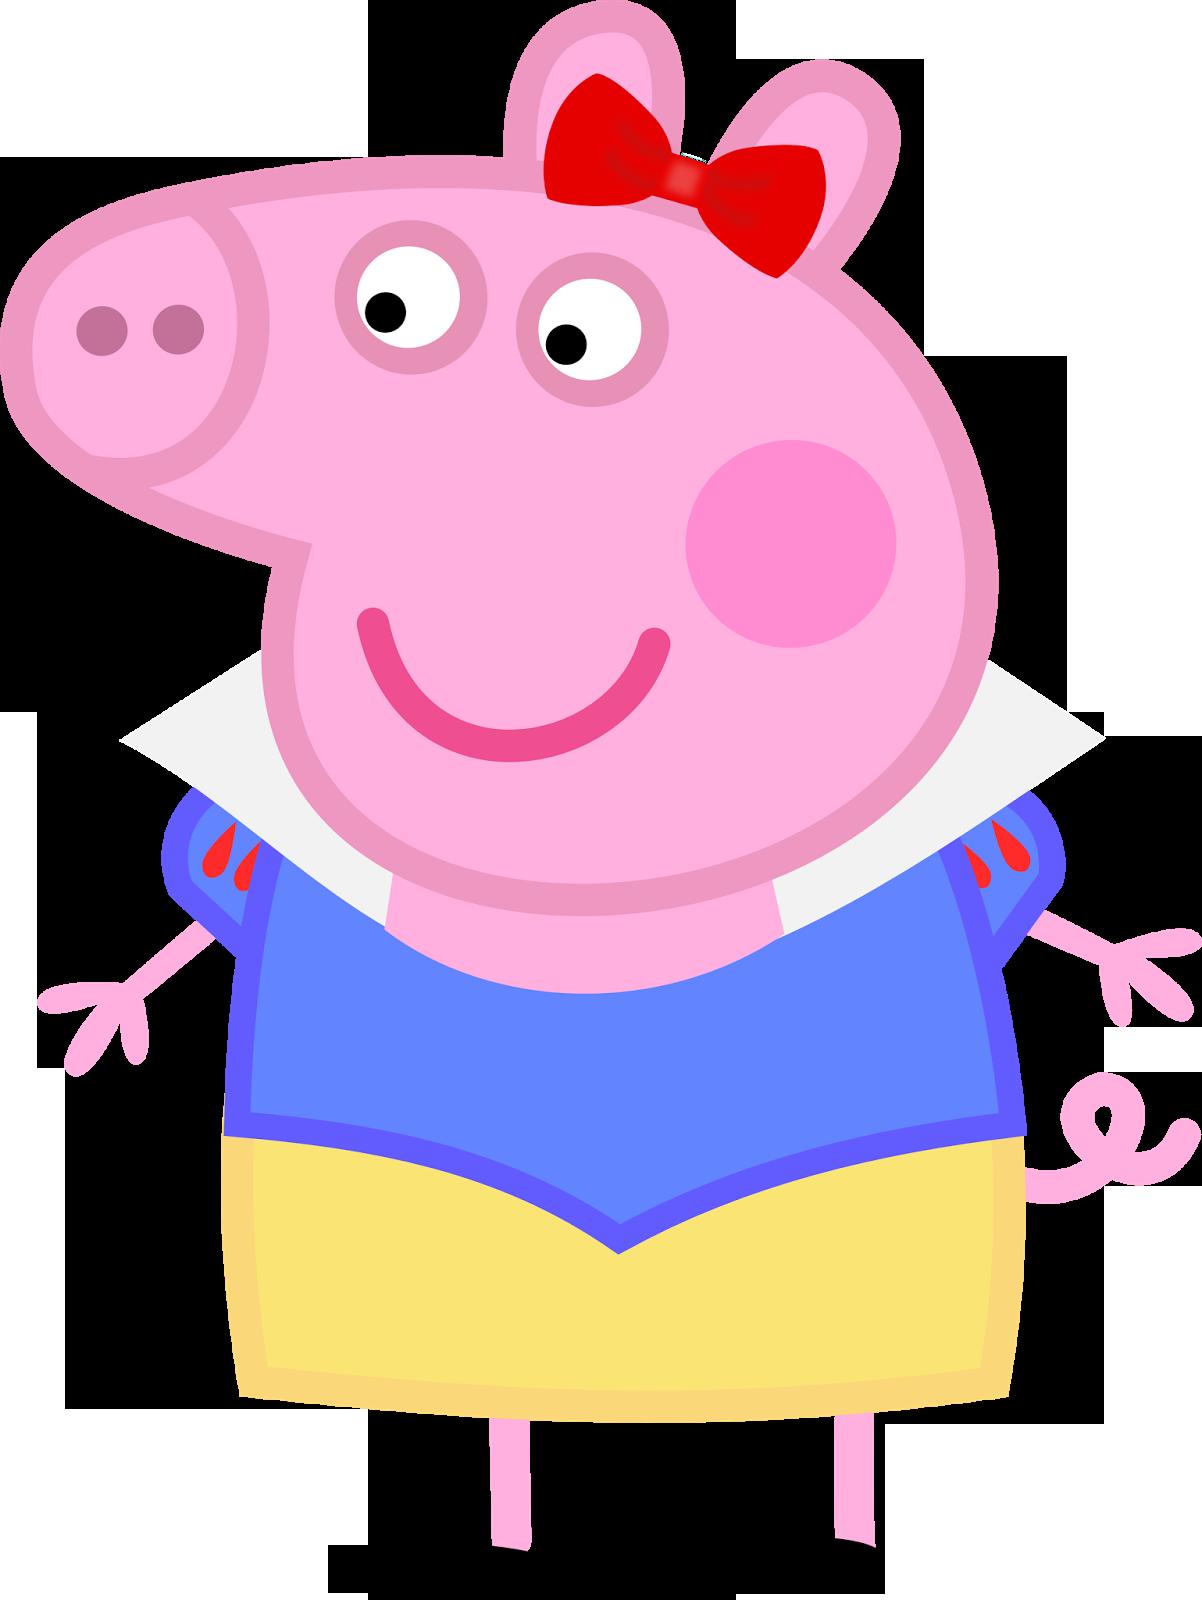 125 imagens Peppa Pig PNG - Imagens PNG Peppa Pig. Baixe ...